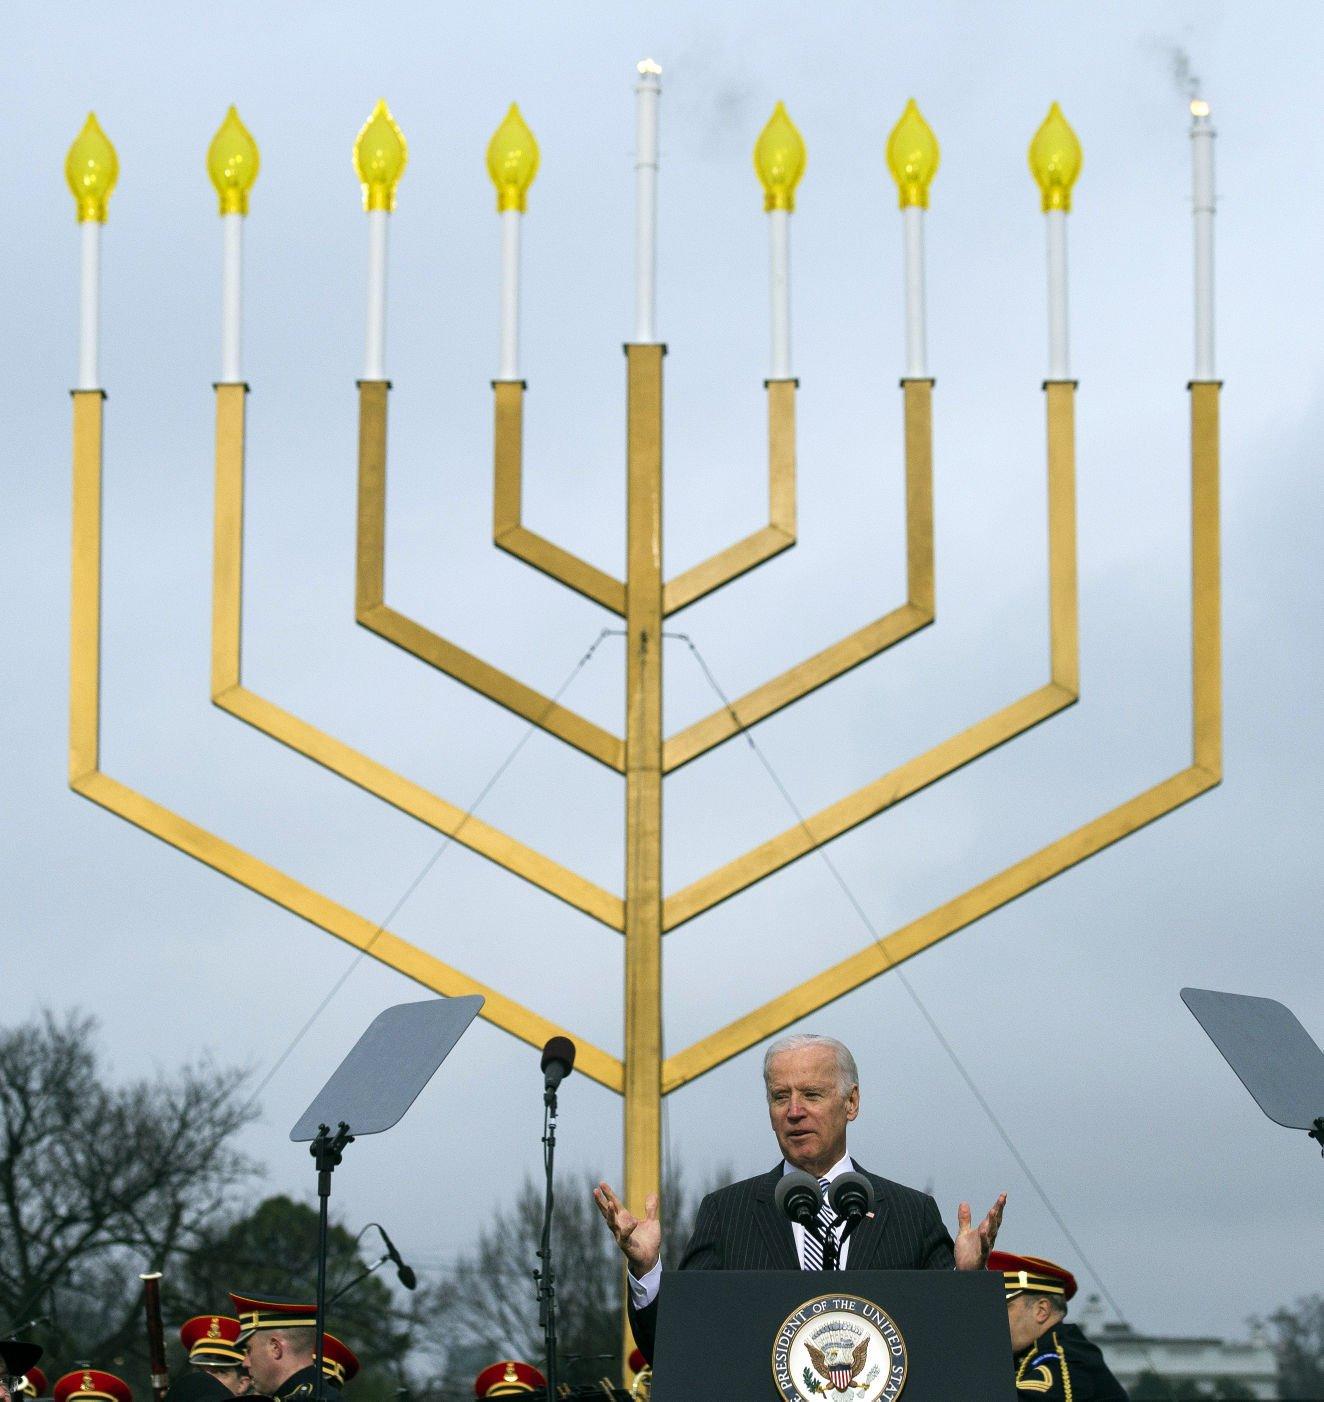 Biden At Chanukah Candle Lighting: Jewish Heritage Is American Heritage